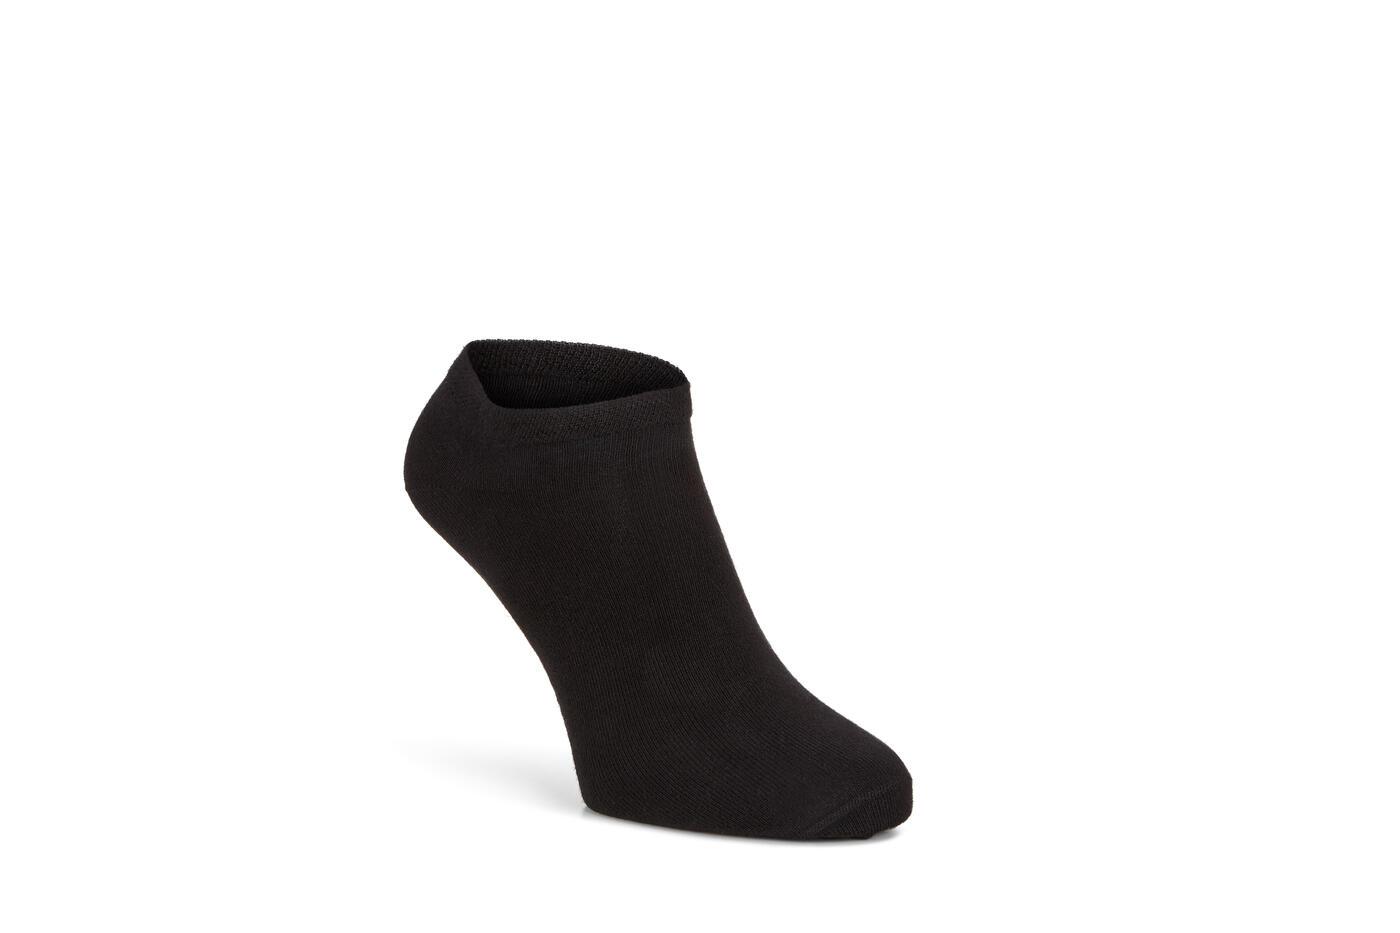 ECCO Bamboo No-Show Socks (2 pairs per pack)